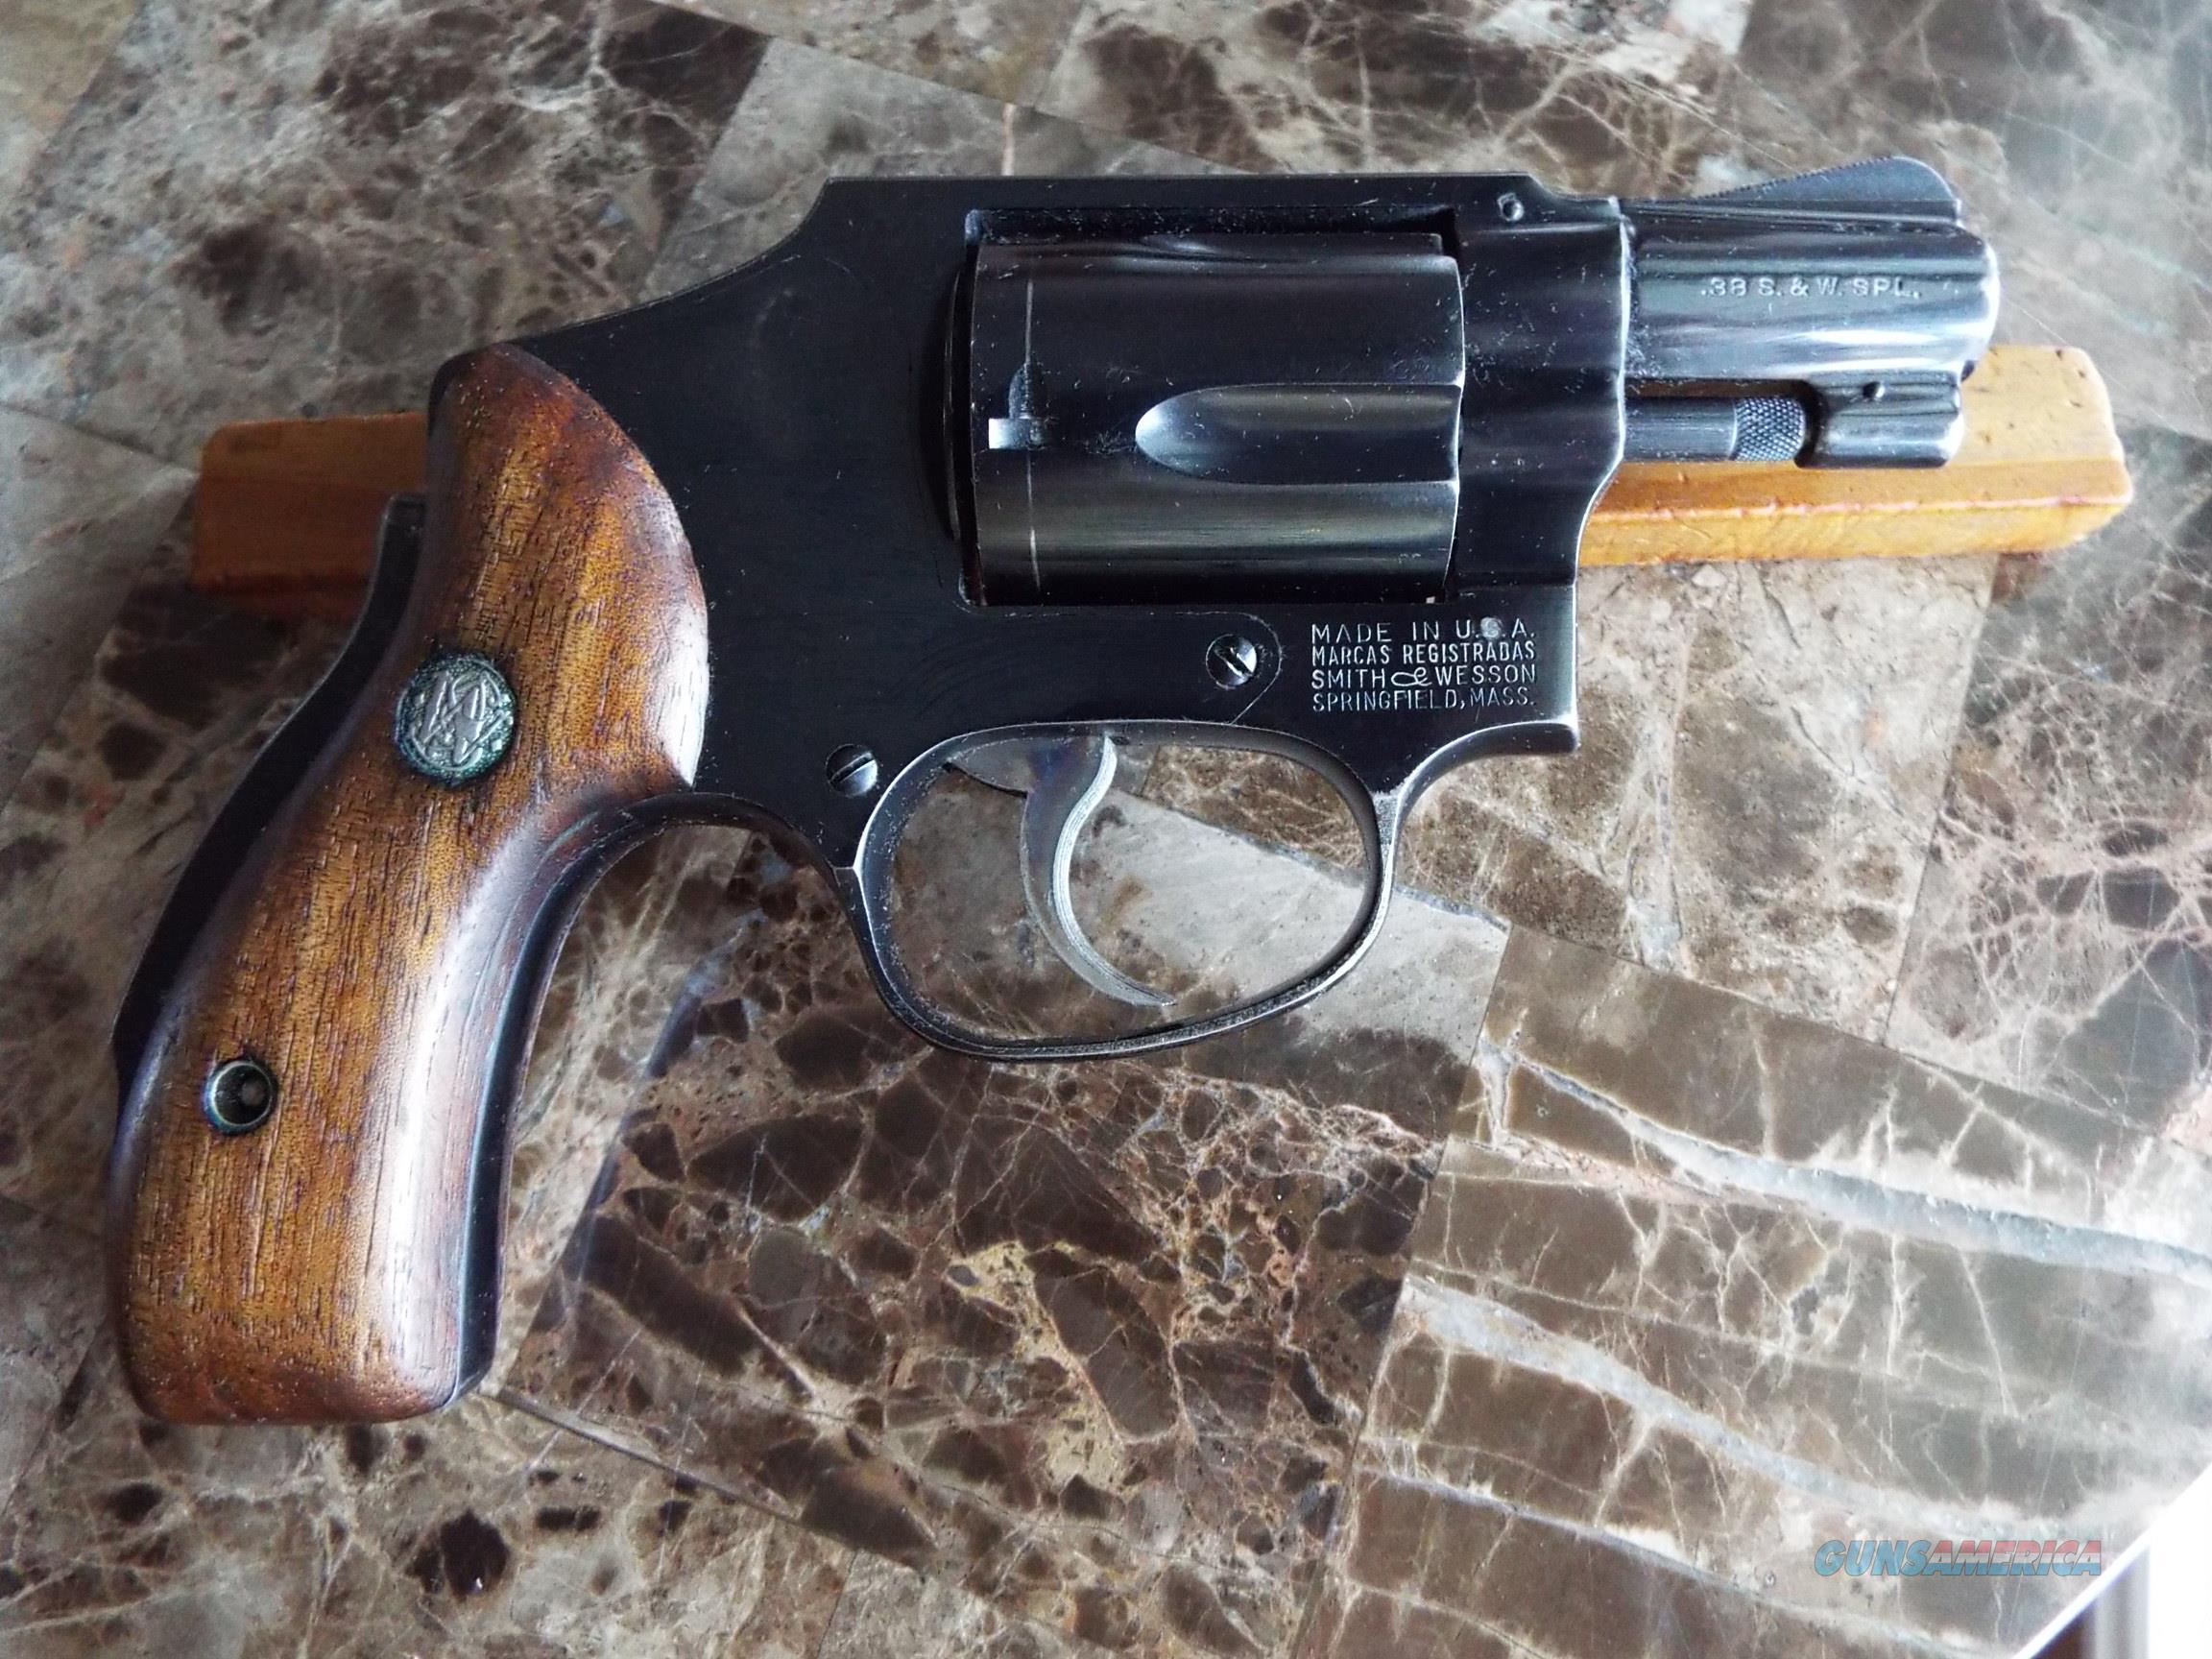 S&W Smith & Wesson Model 40 Centennial 38 Spl.  Nice!   LAYAWAY OPTION  Guns > Pistols > Smith & Wesson Revolvers > Small Frame ( J )